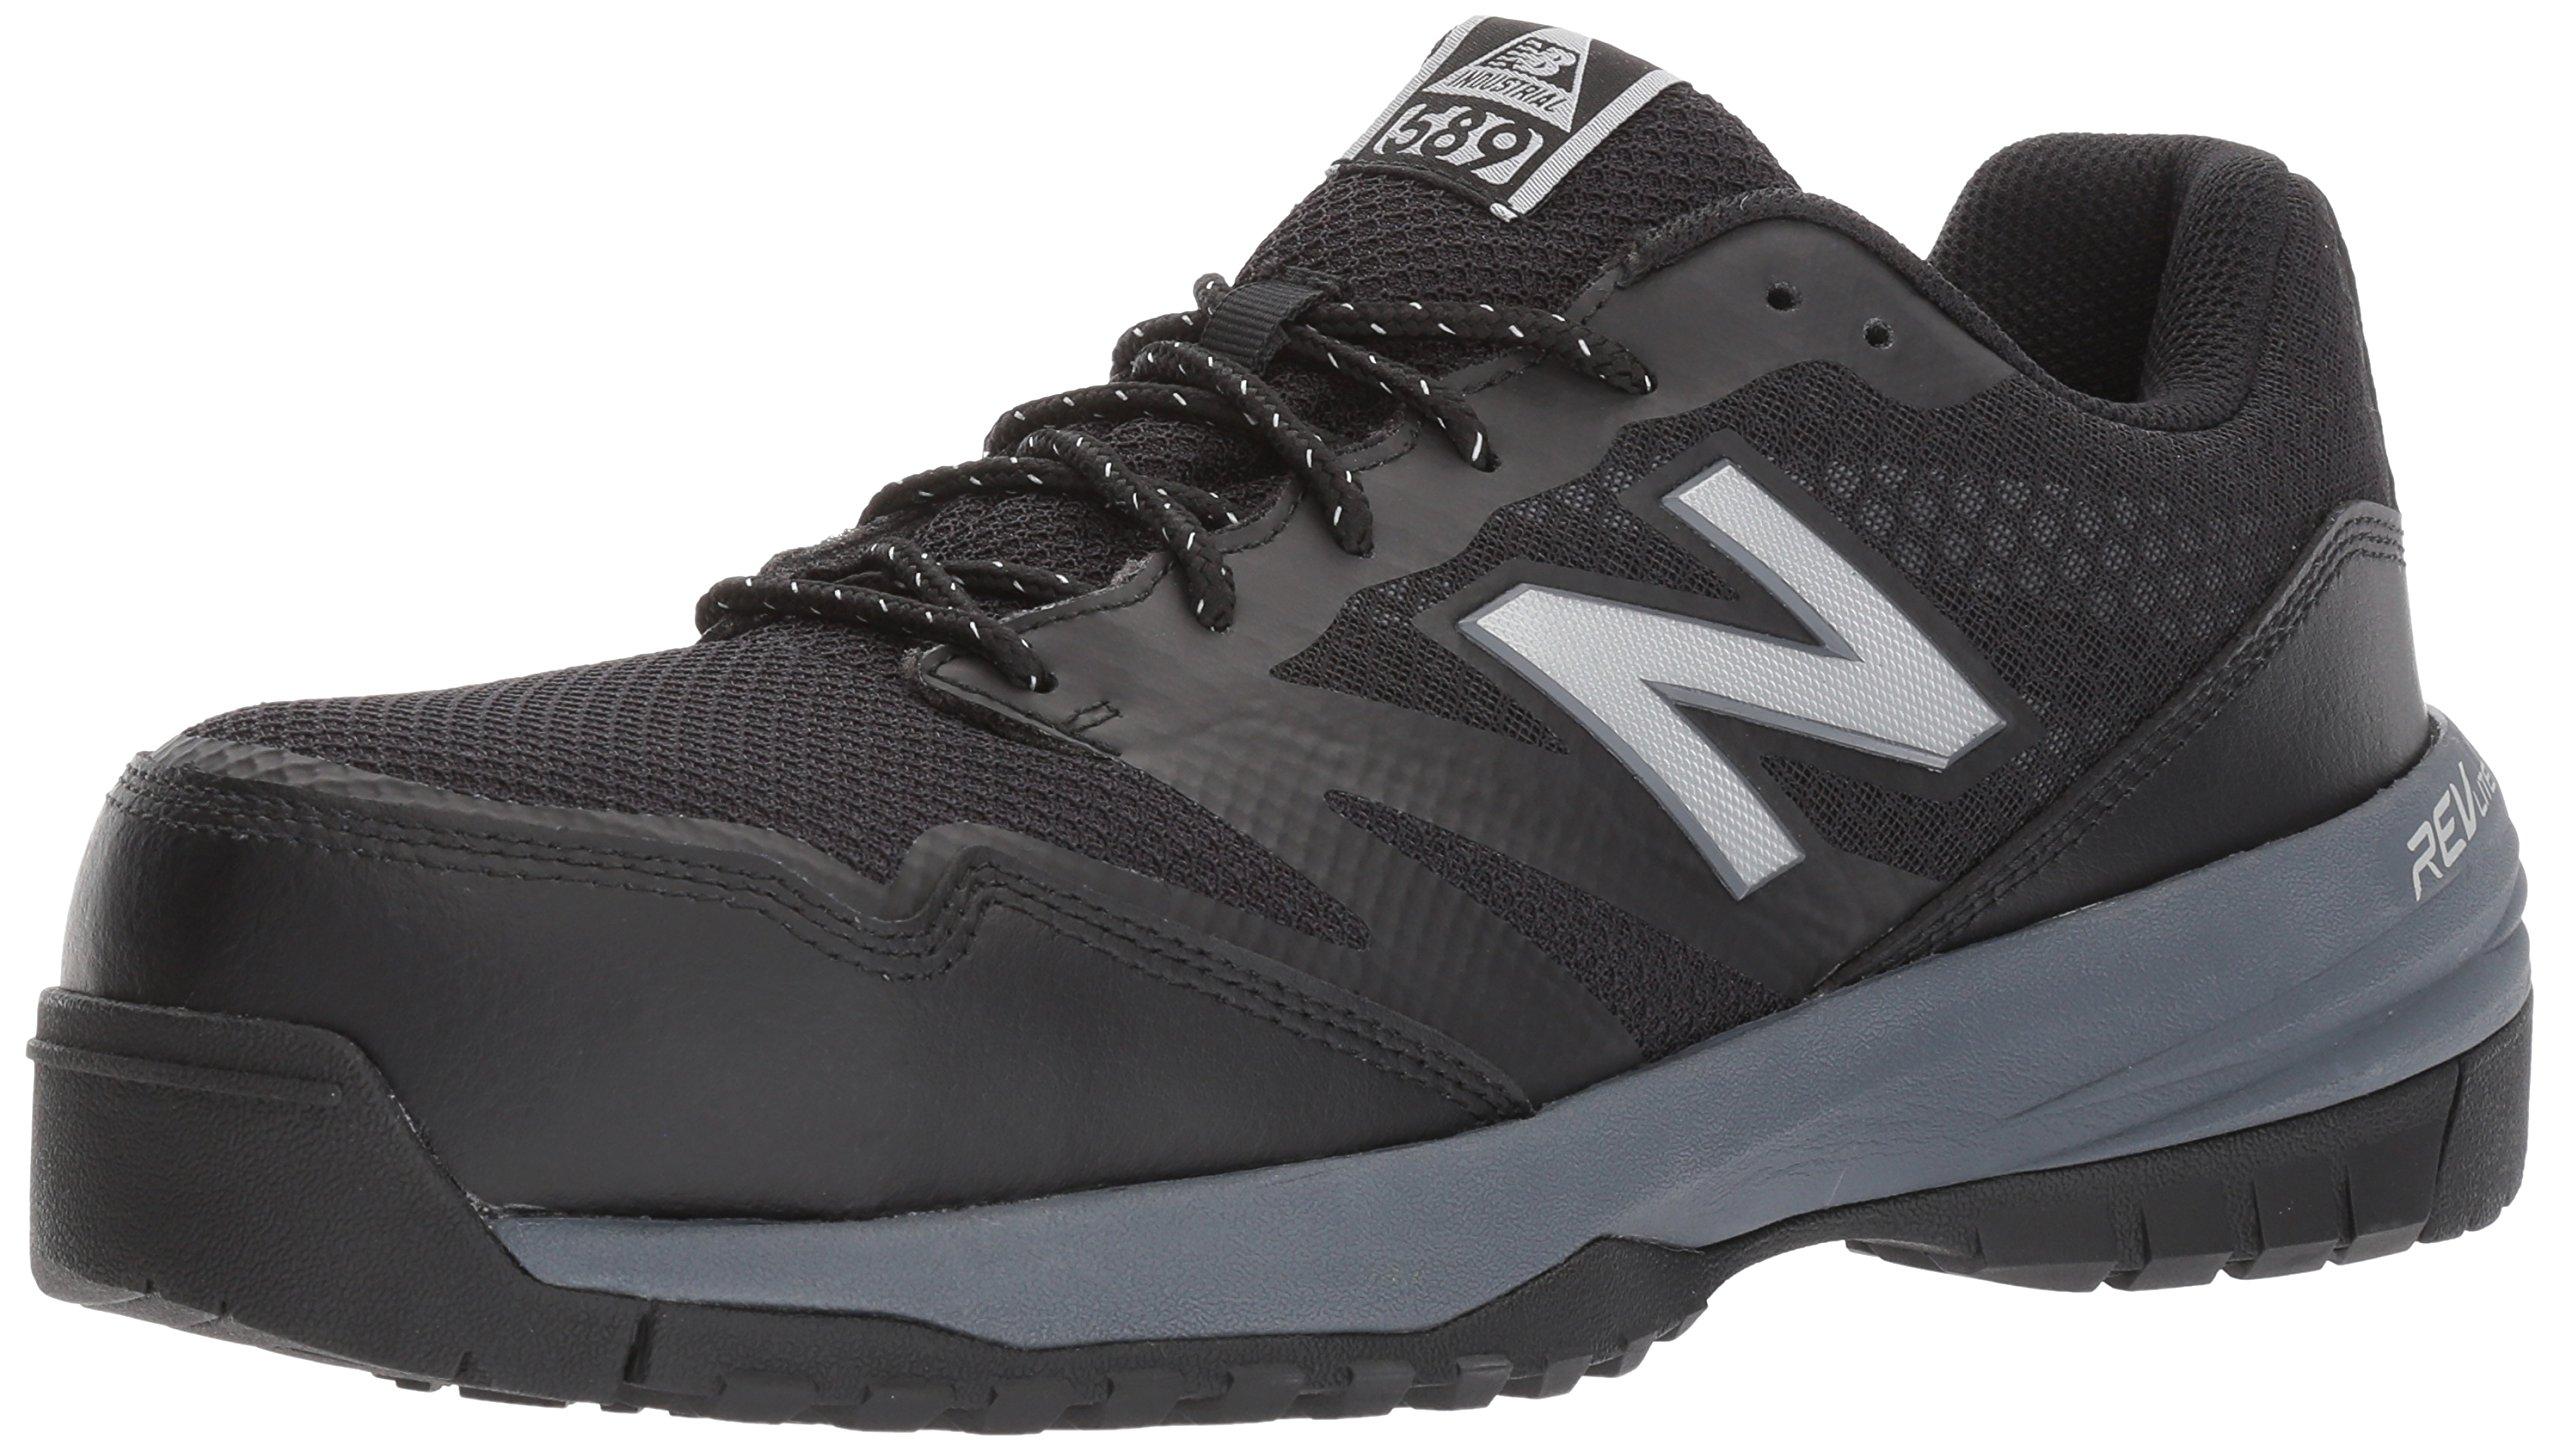 New Balance Men's 589V1 Work Training Shoe, Black/Grey, 10.5 4E US